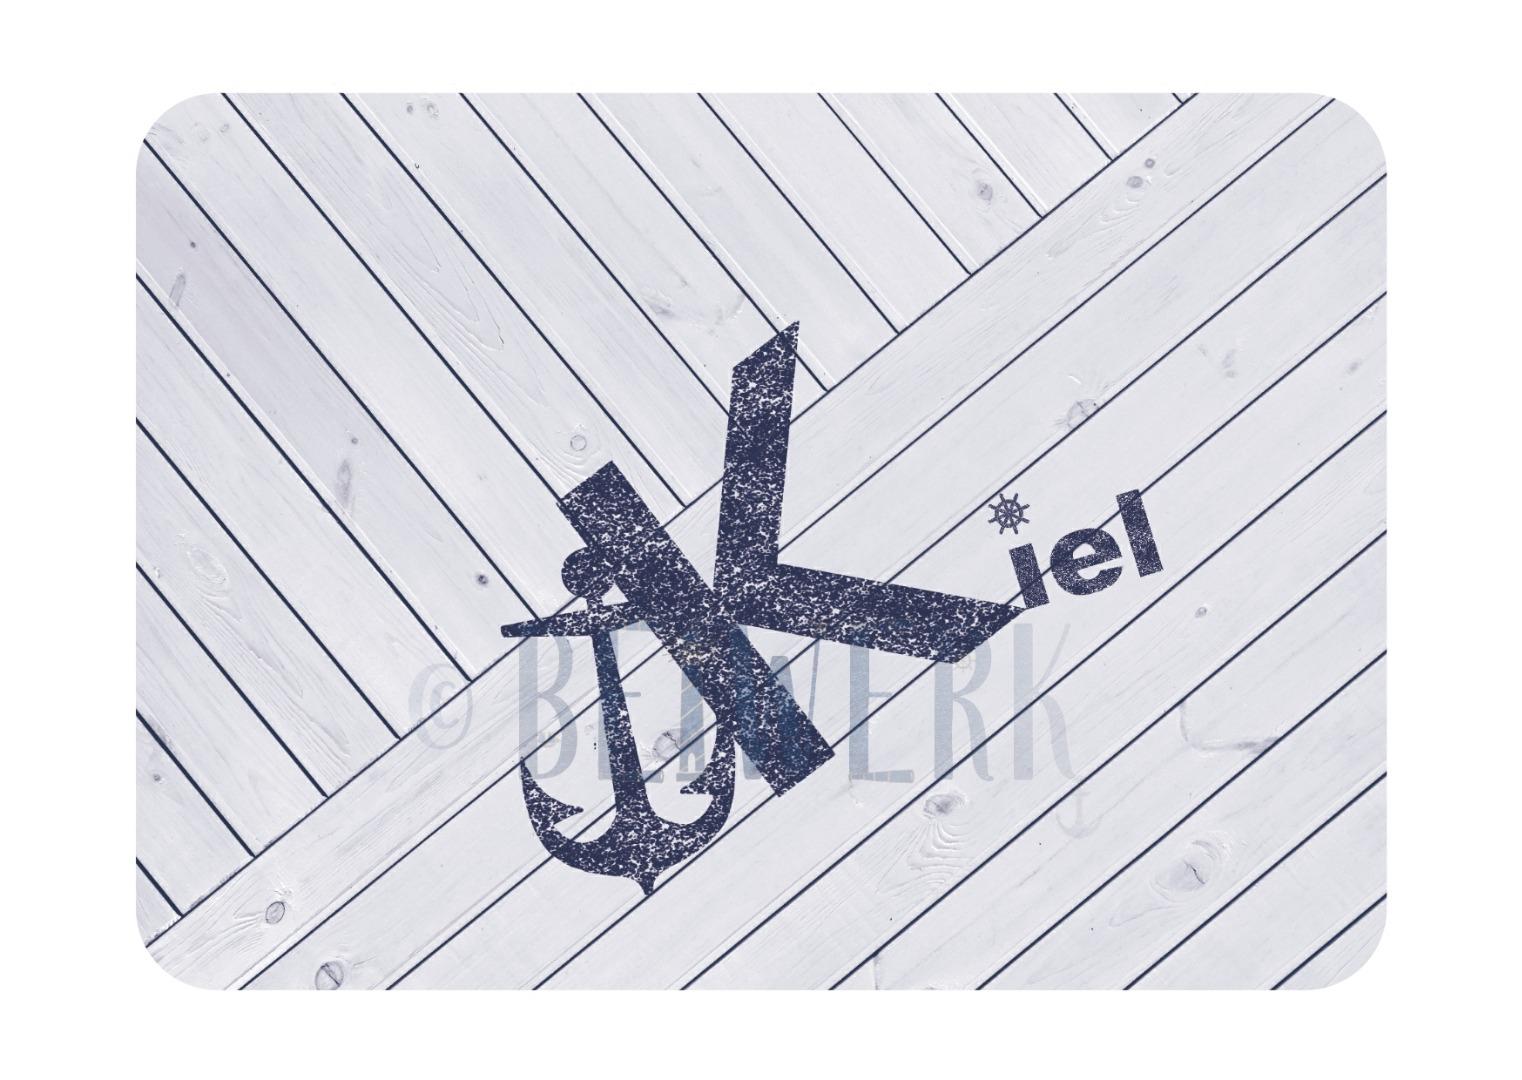 Postkarte Kiel nautisch - 1